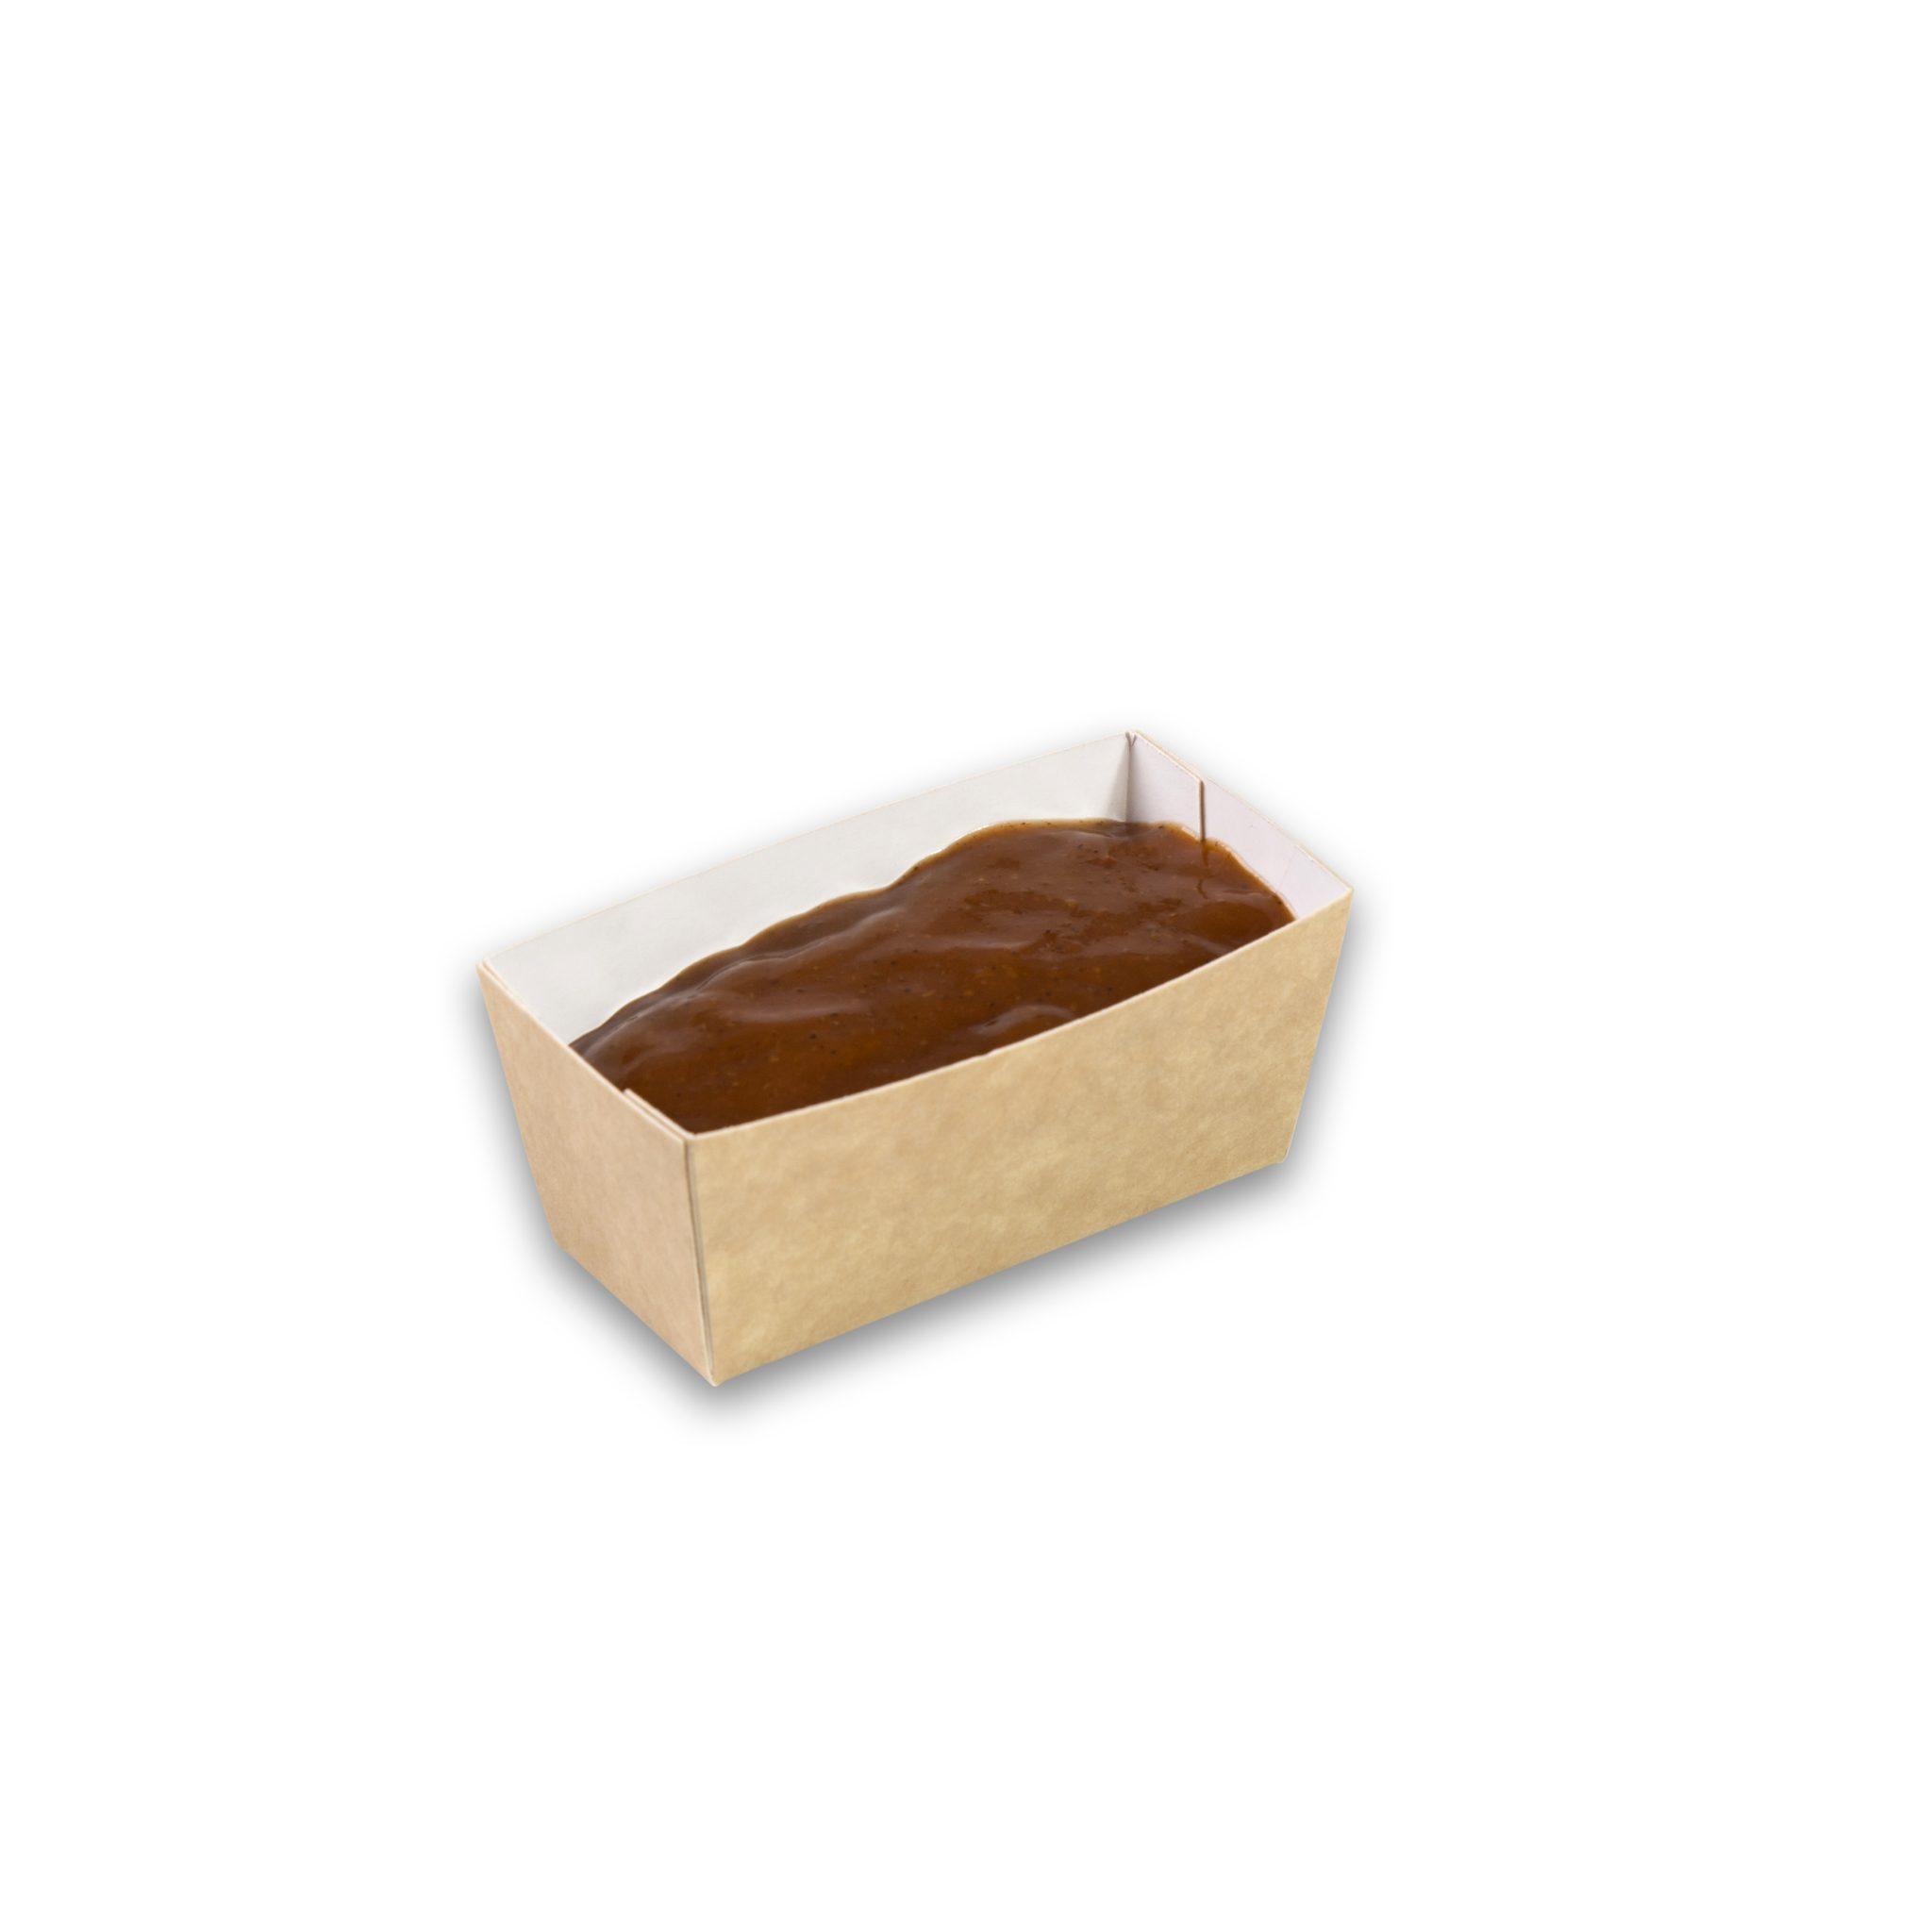 Kraft-karton-sausbakje-30x70x35-mm-snackverpakking